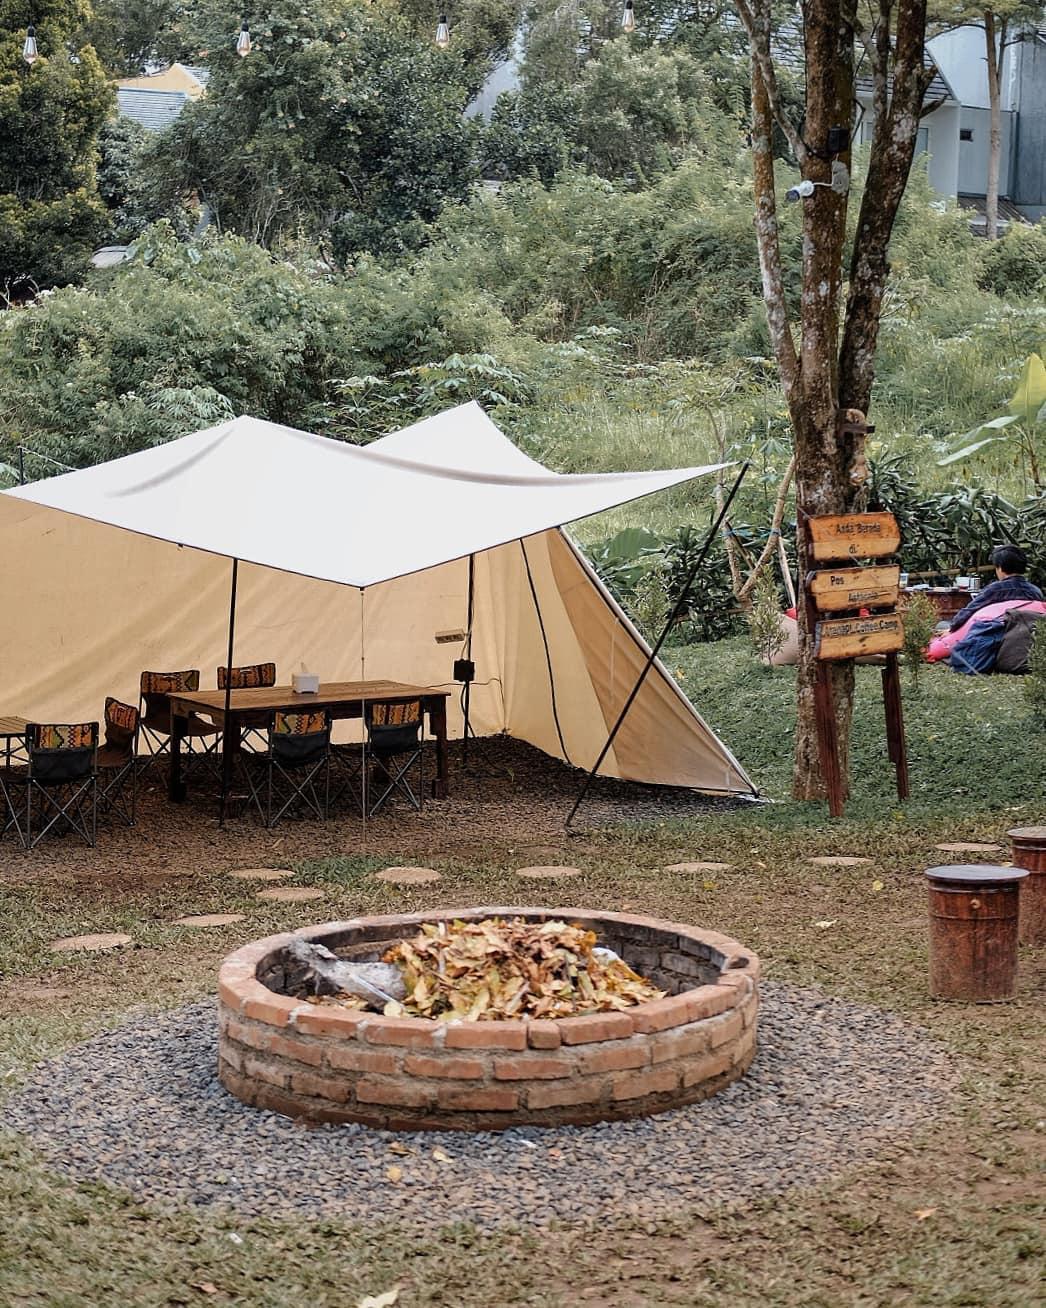 Tempat Api Unggun Di Atanapi Coffee Camp Image From @gemarngopi